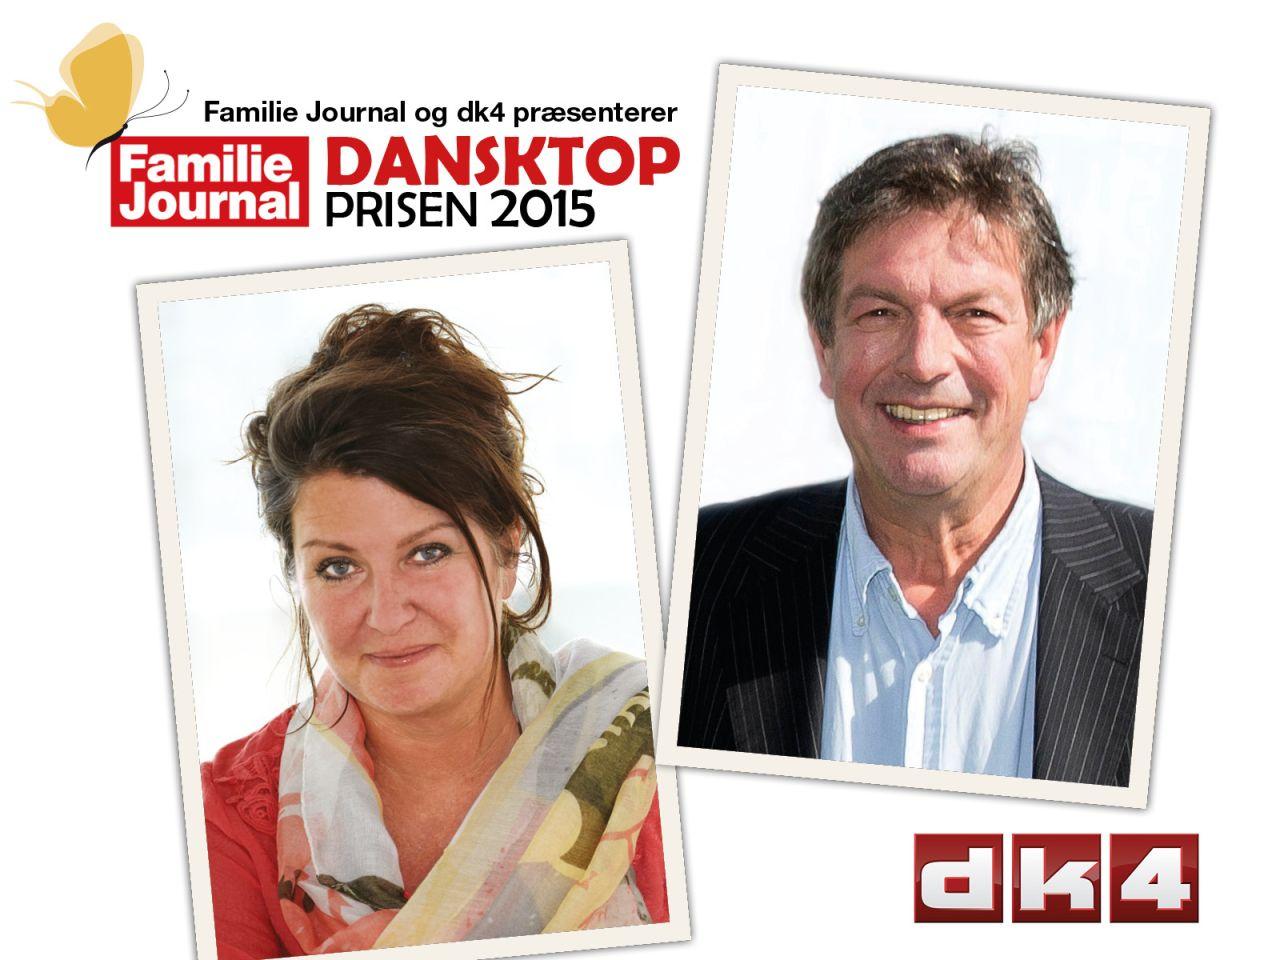 Dansktop Prisen 2015